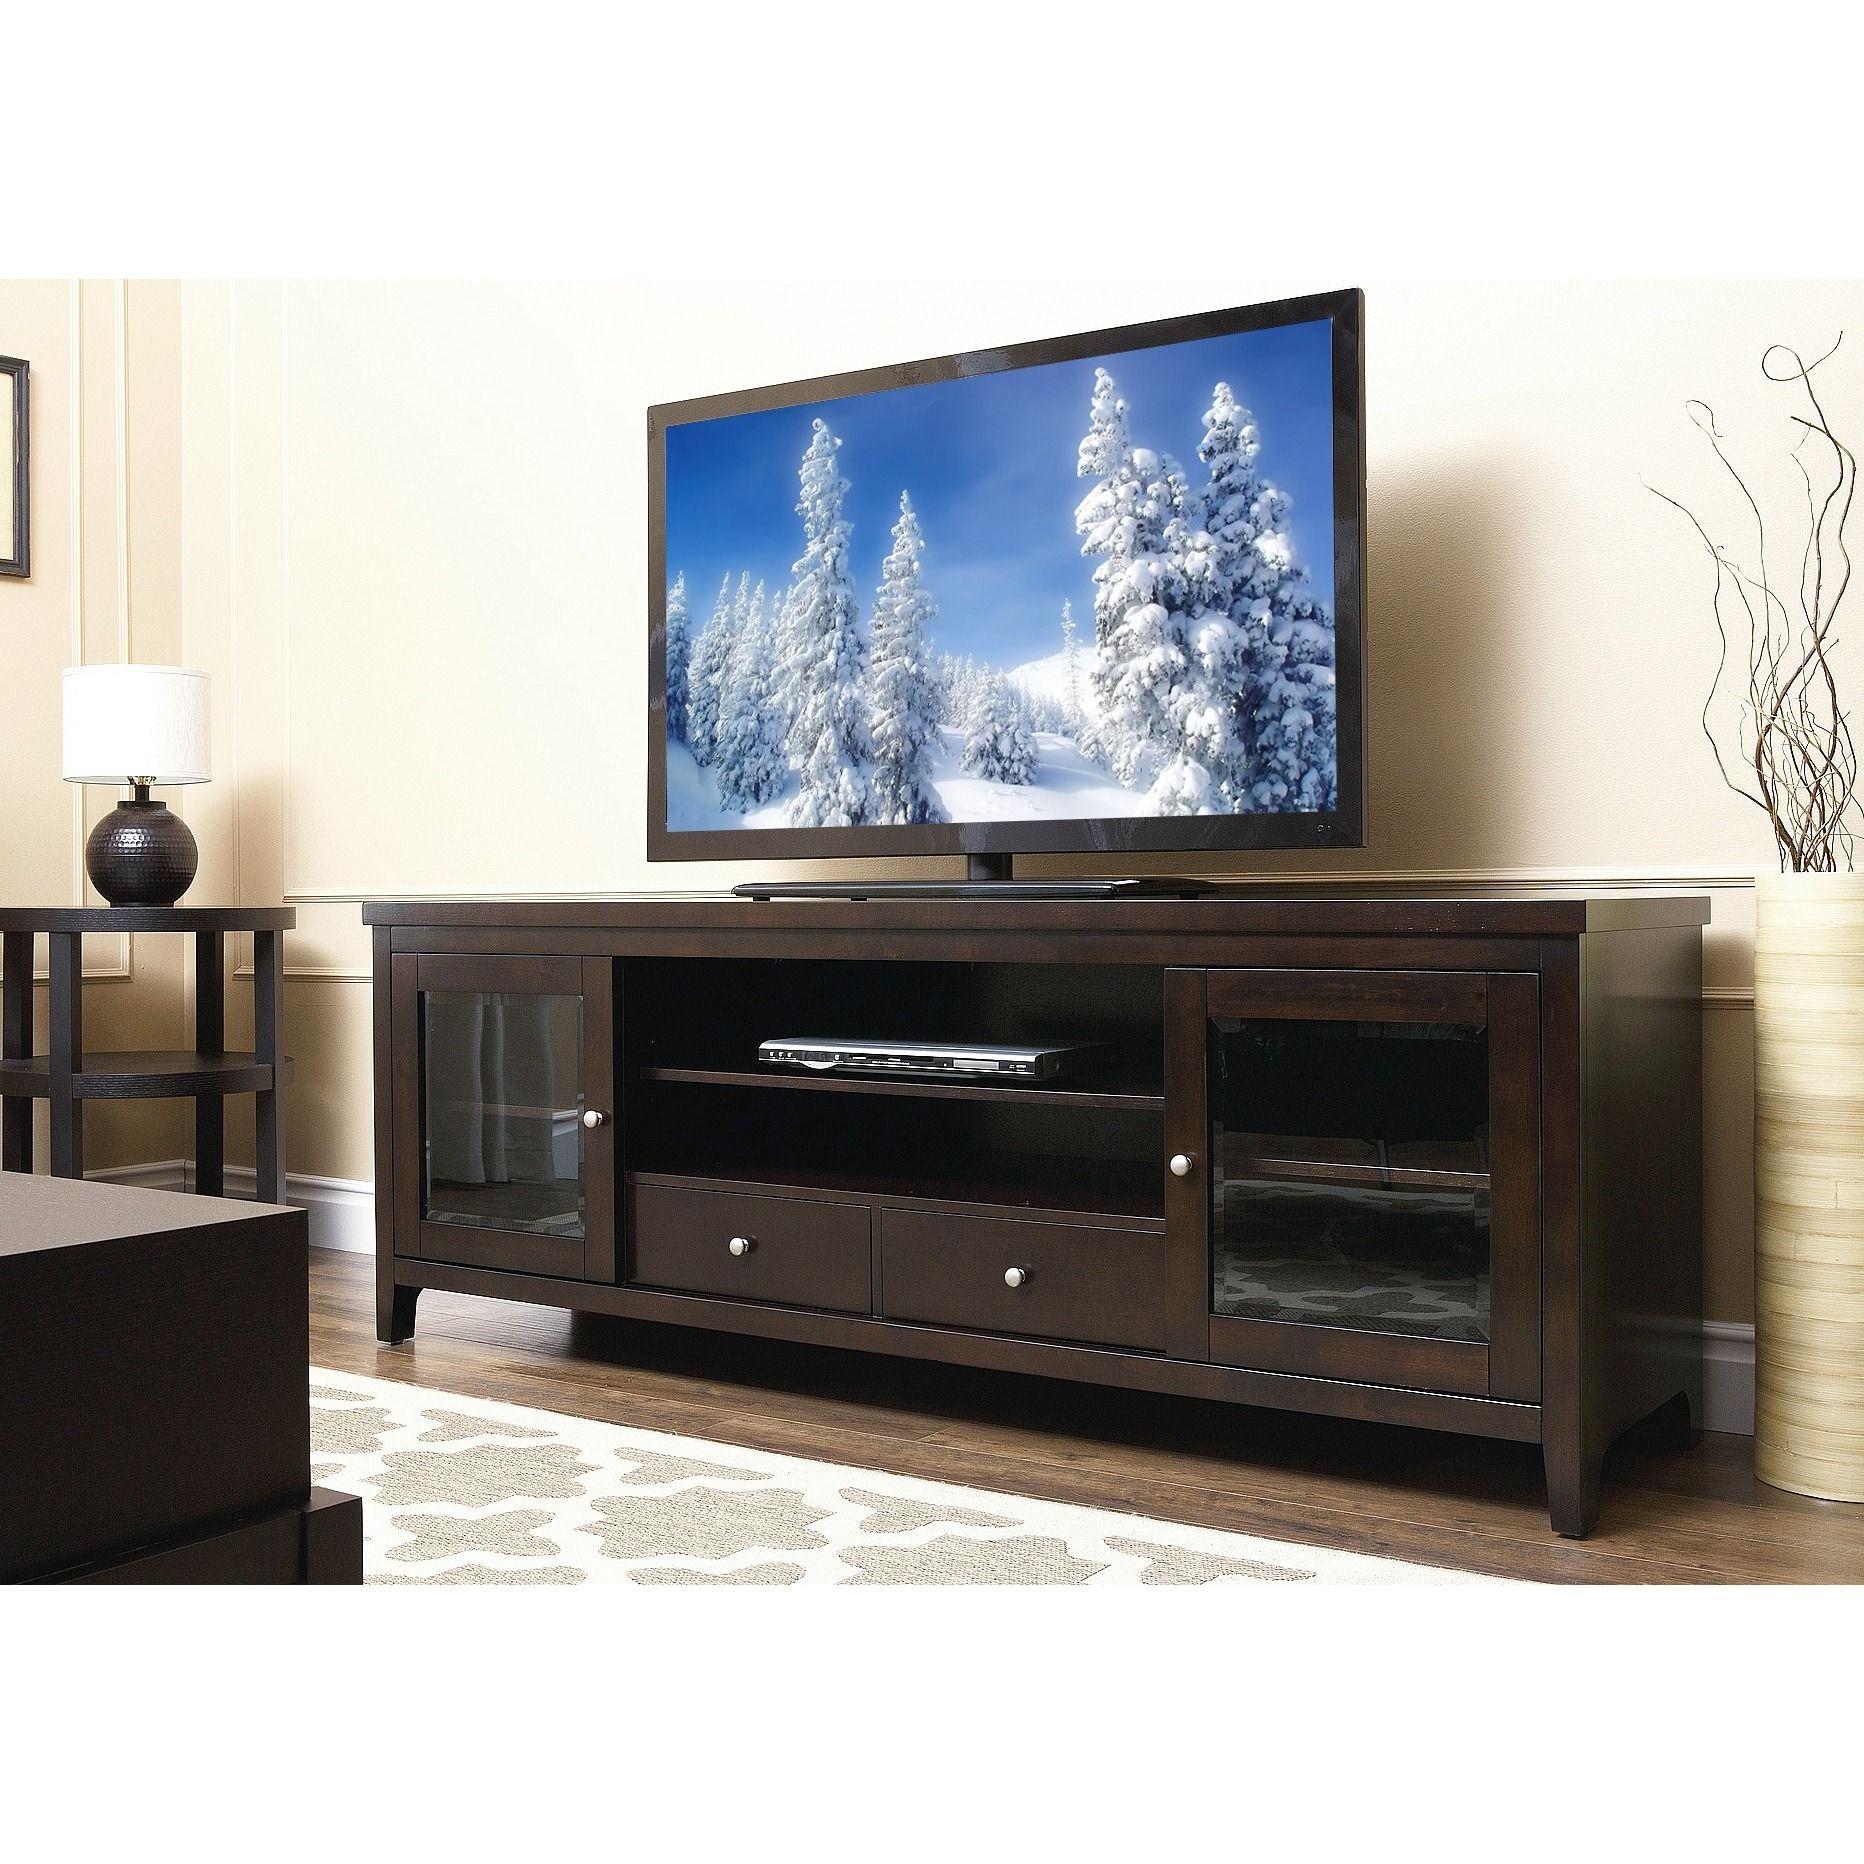 Abbyson Charleston Solid Wood 72-inch TV Console